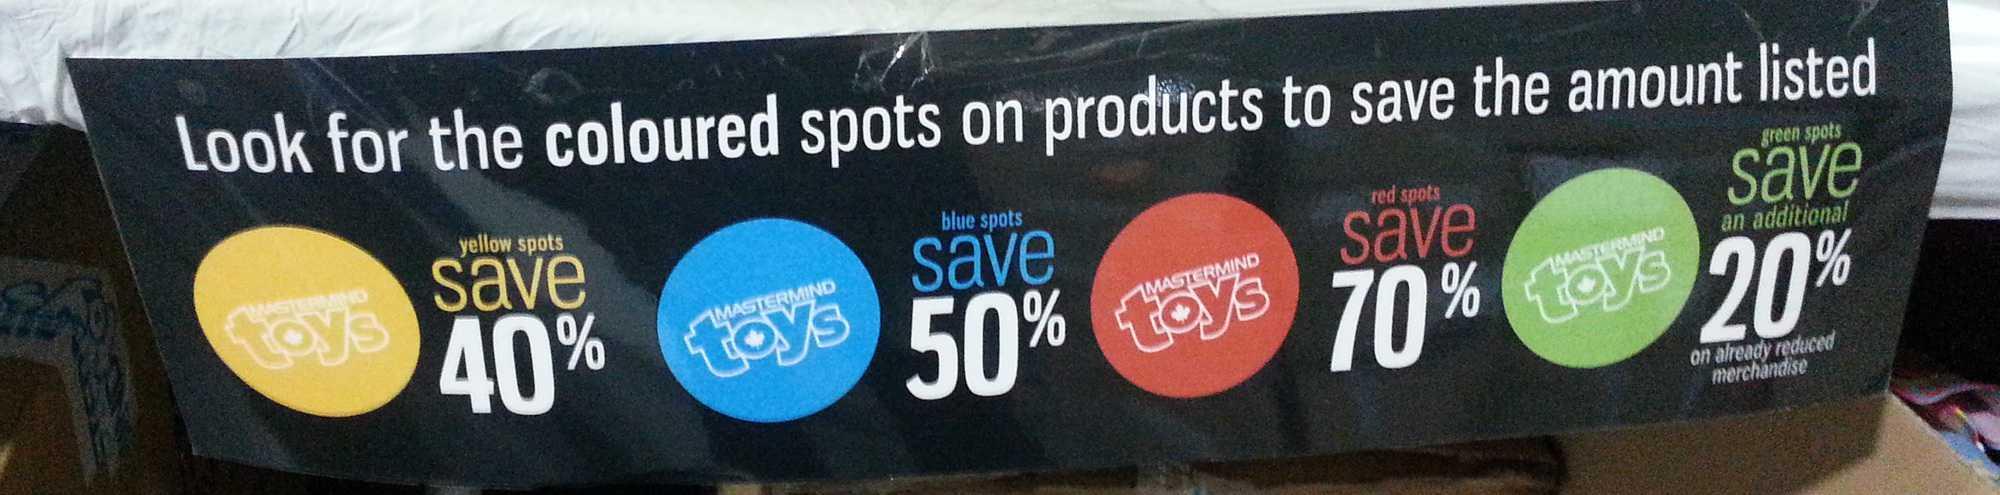 mastermind toys warehouse sale 2014 prices 2